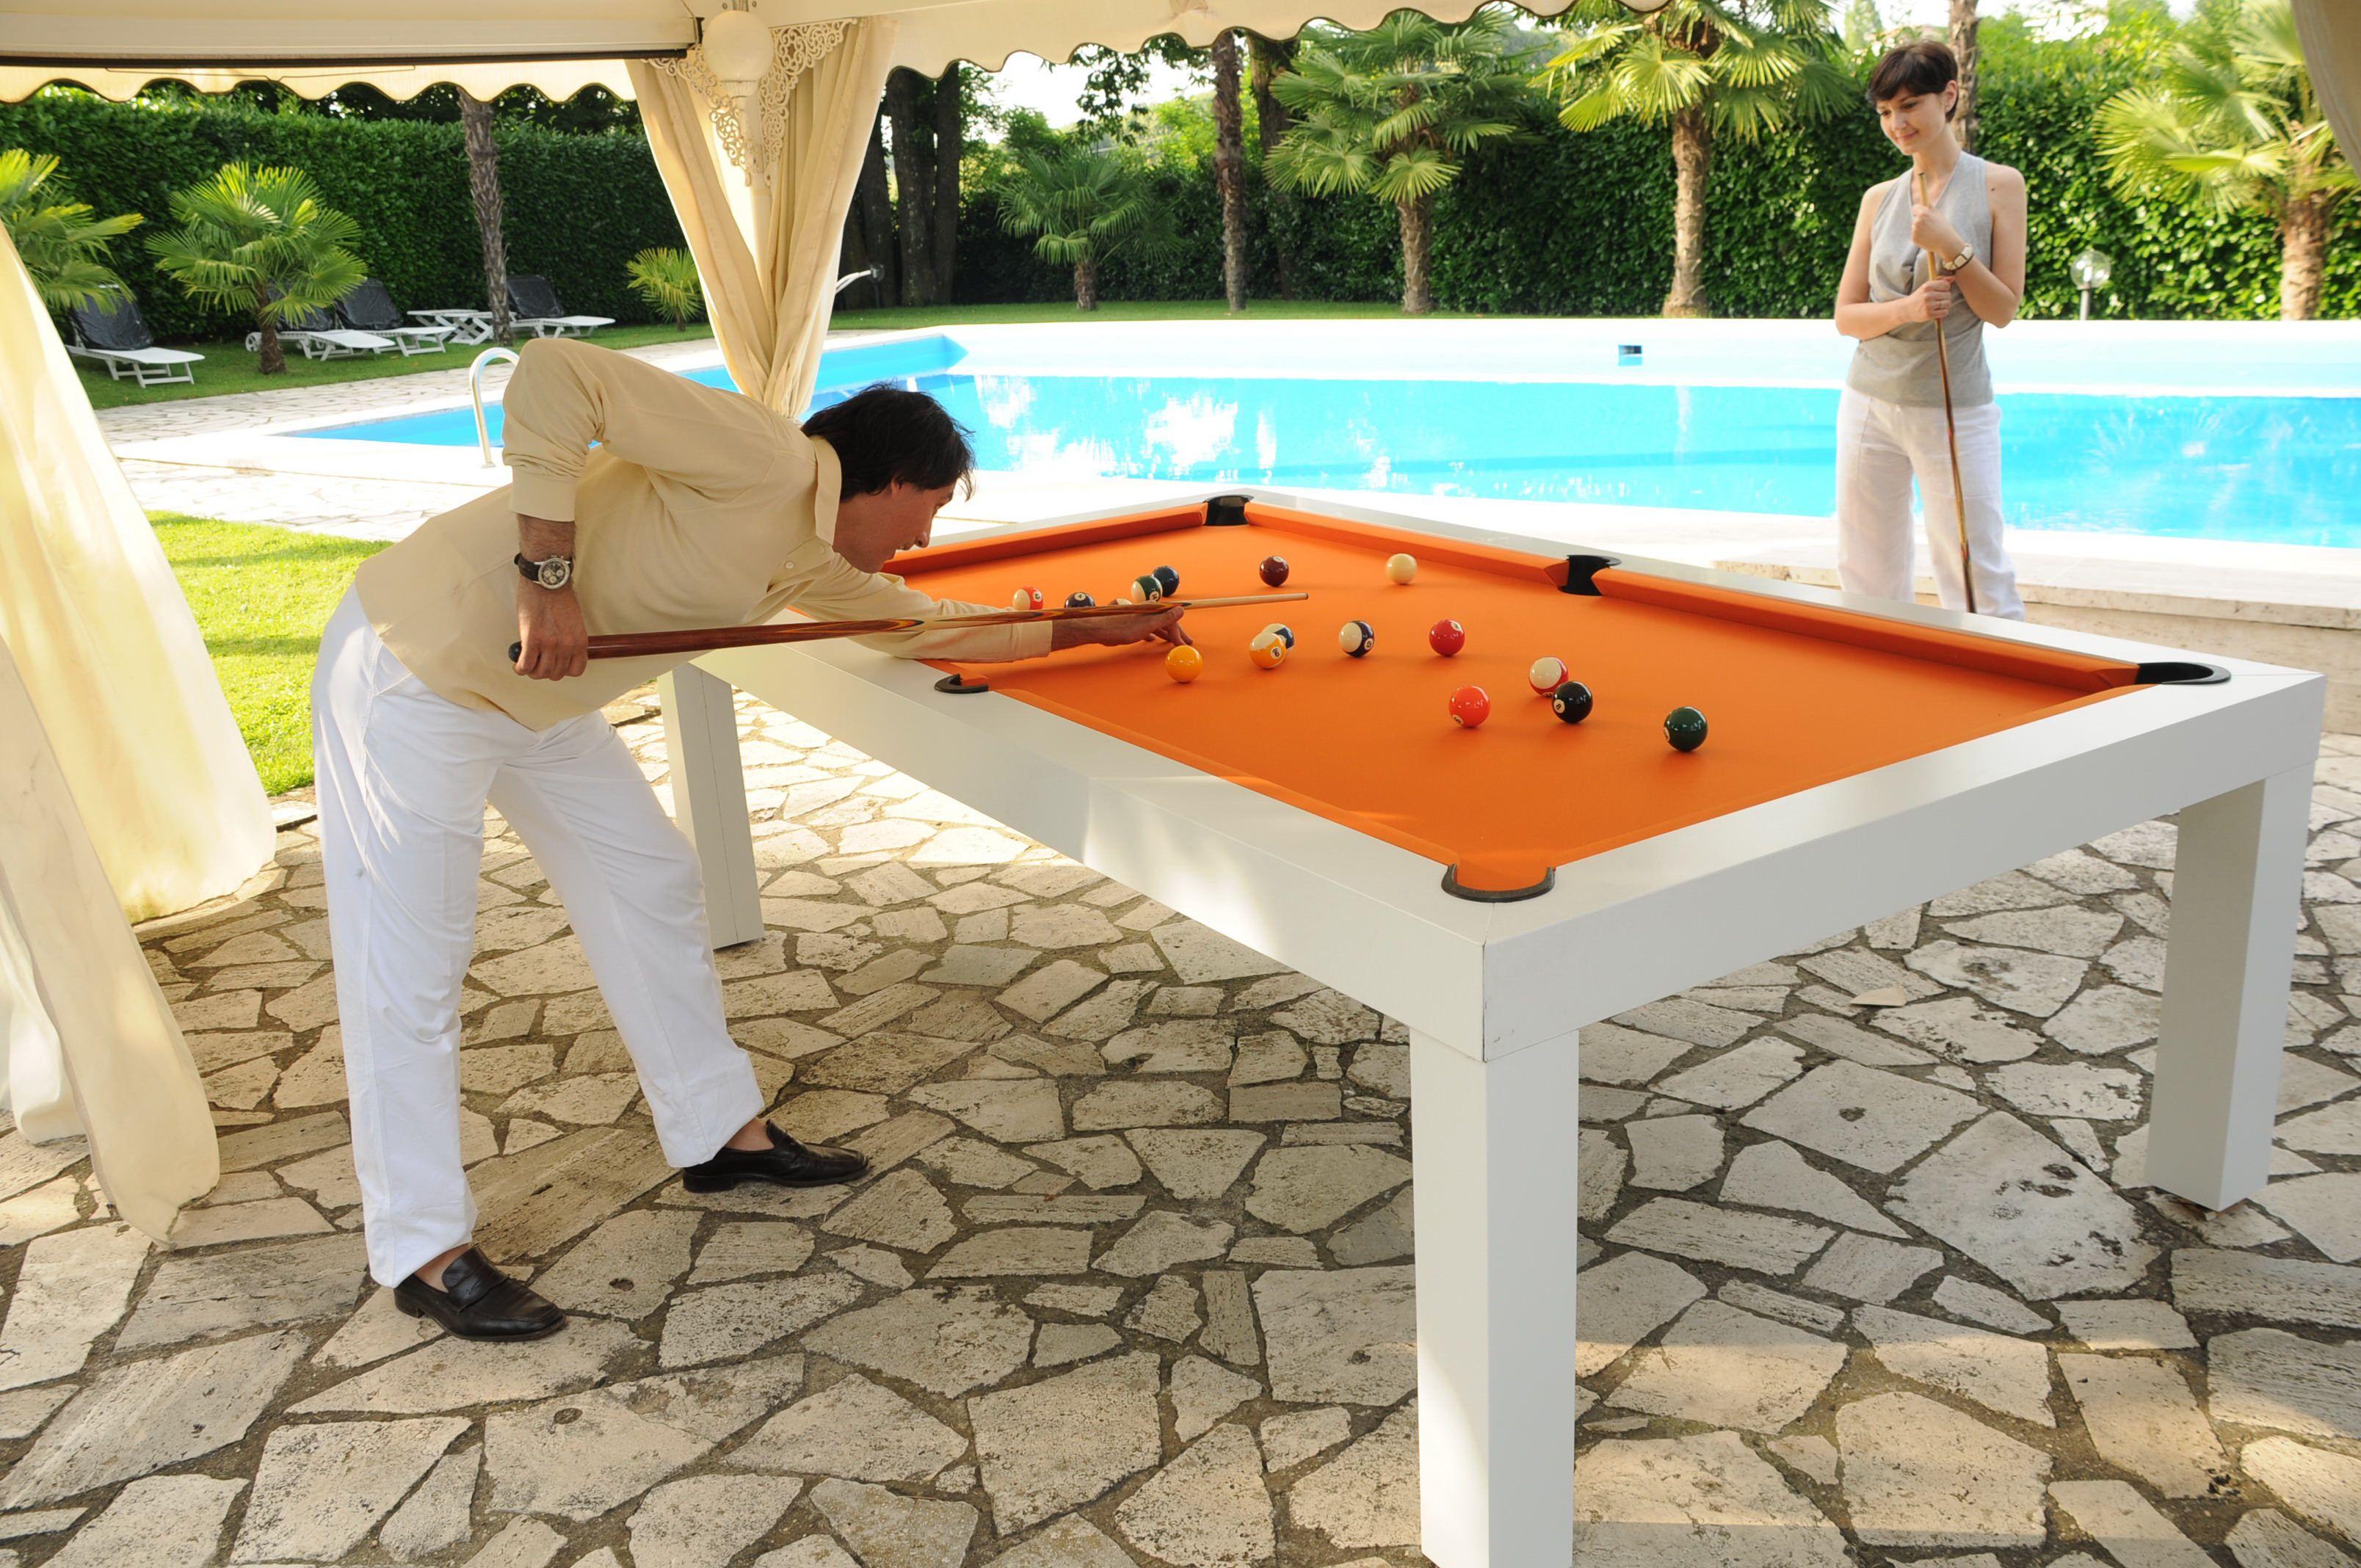 Billiard Table Capri Outdoor Pool Billiard Dining Table Snooker Billiard Room Billiards Design Luxury Hi Outdoor Pool Table Pool Table Outdoor Pool